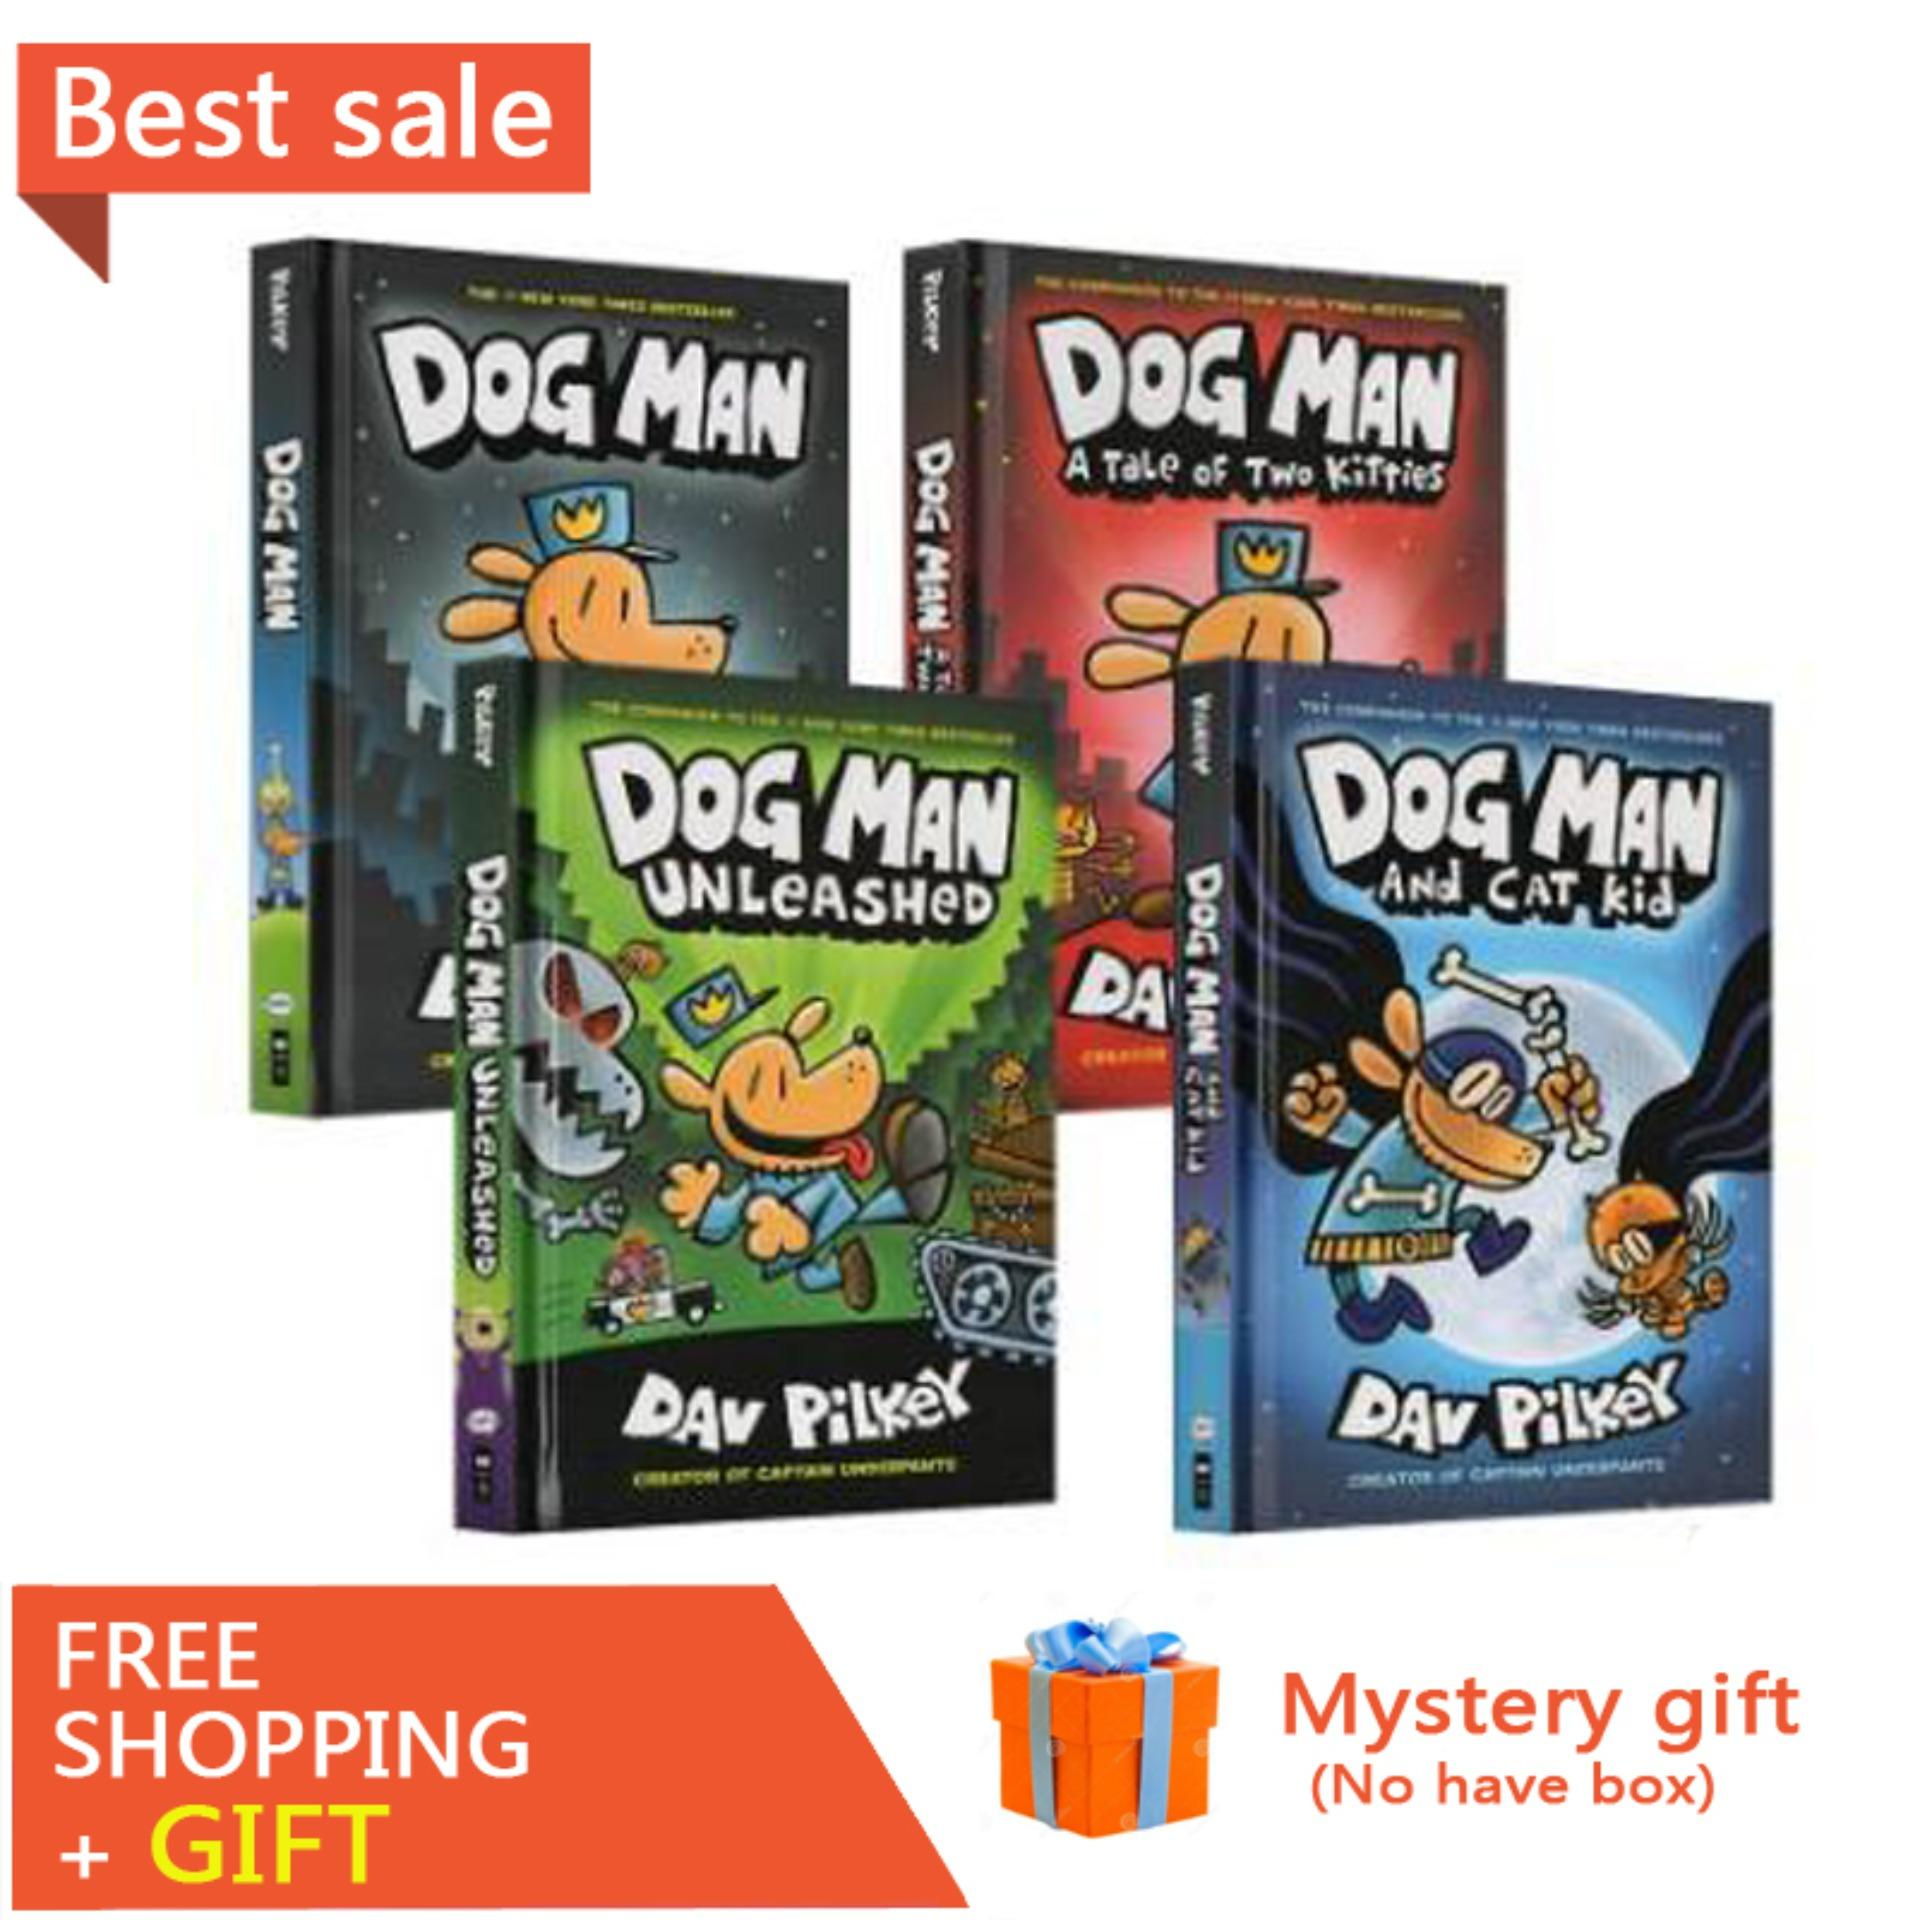 DOG MAN 4 Volumes Children English Picture Books Funny Adventure Cartoons Manga Story Books for Kids Children Comic Book Reading Training